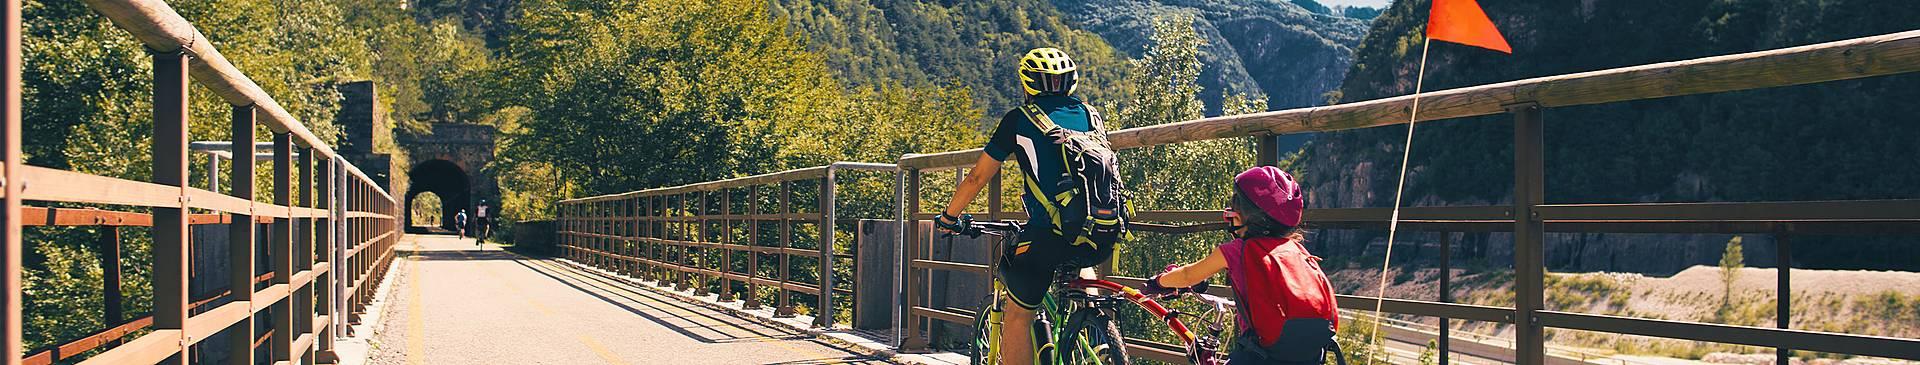 Viaggi in bici in Italia